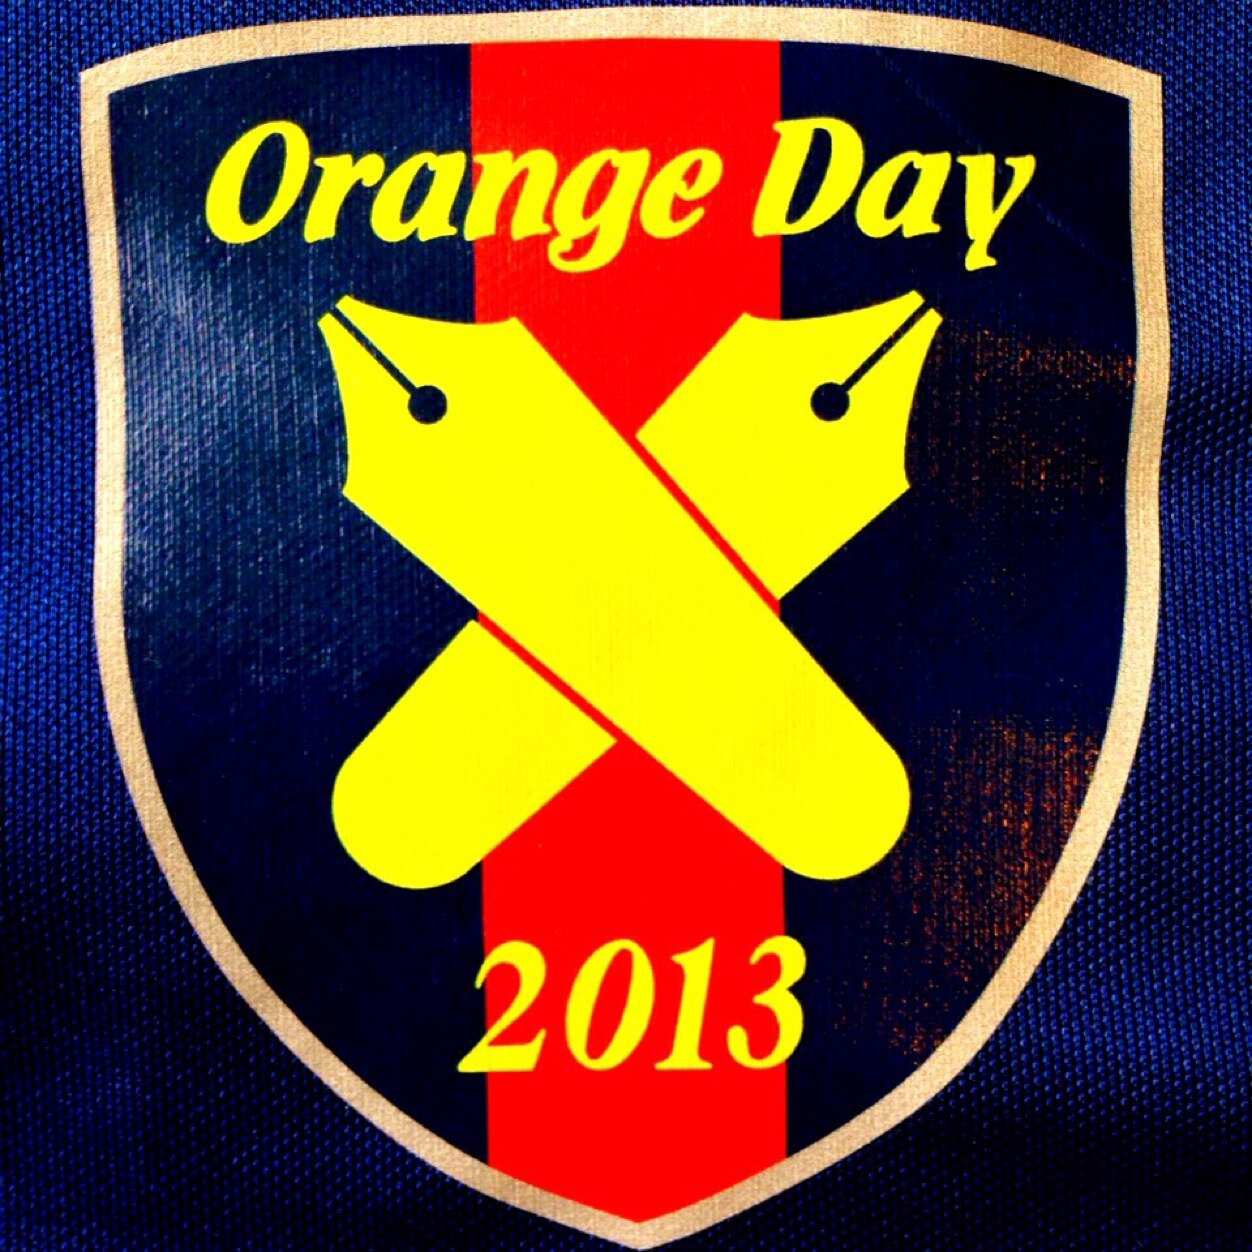 orange day 2014 orangeday 2014 twitter